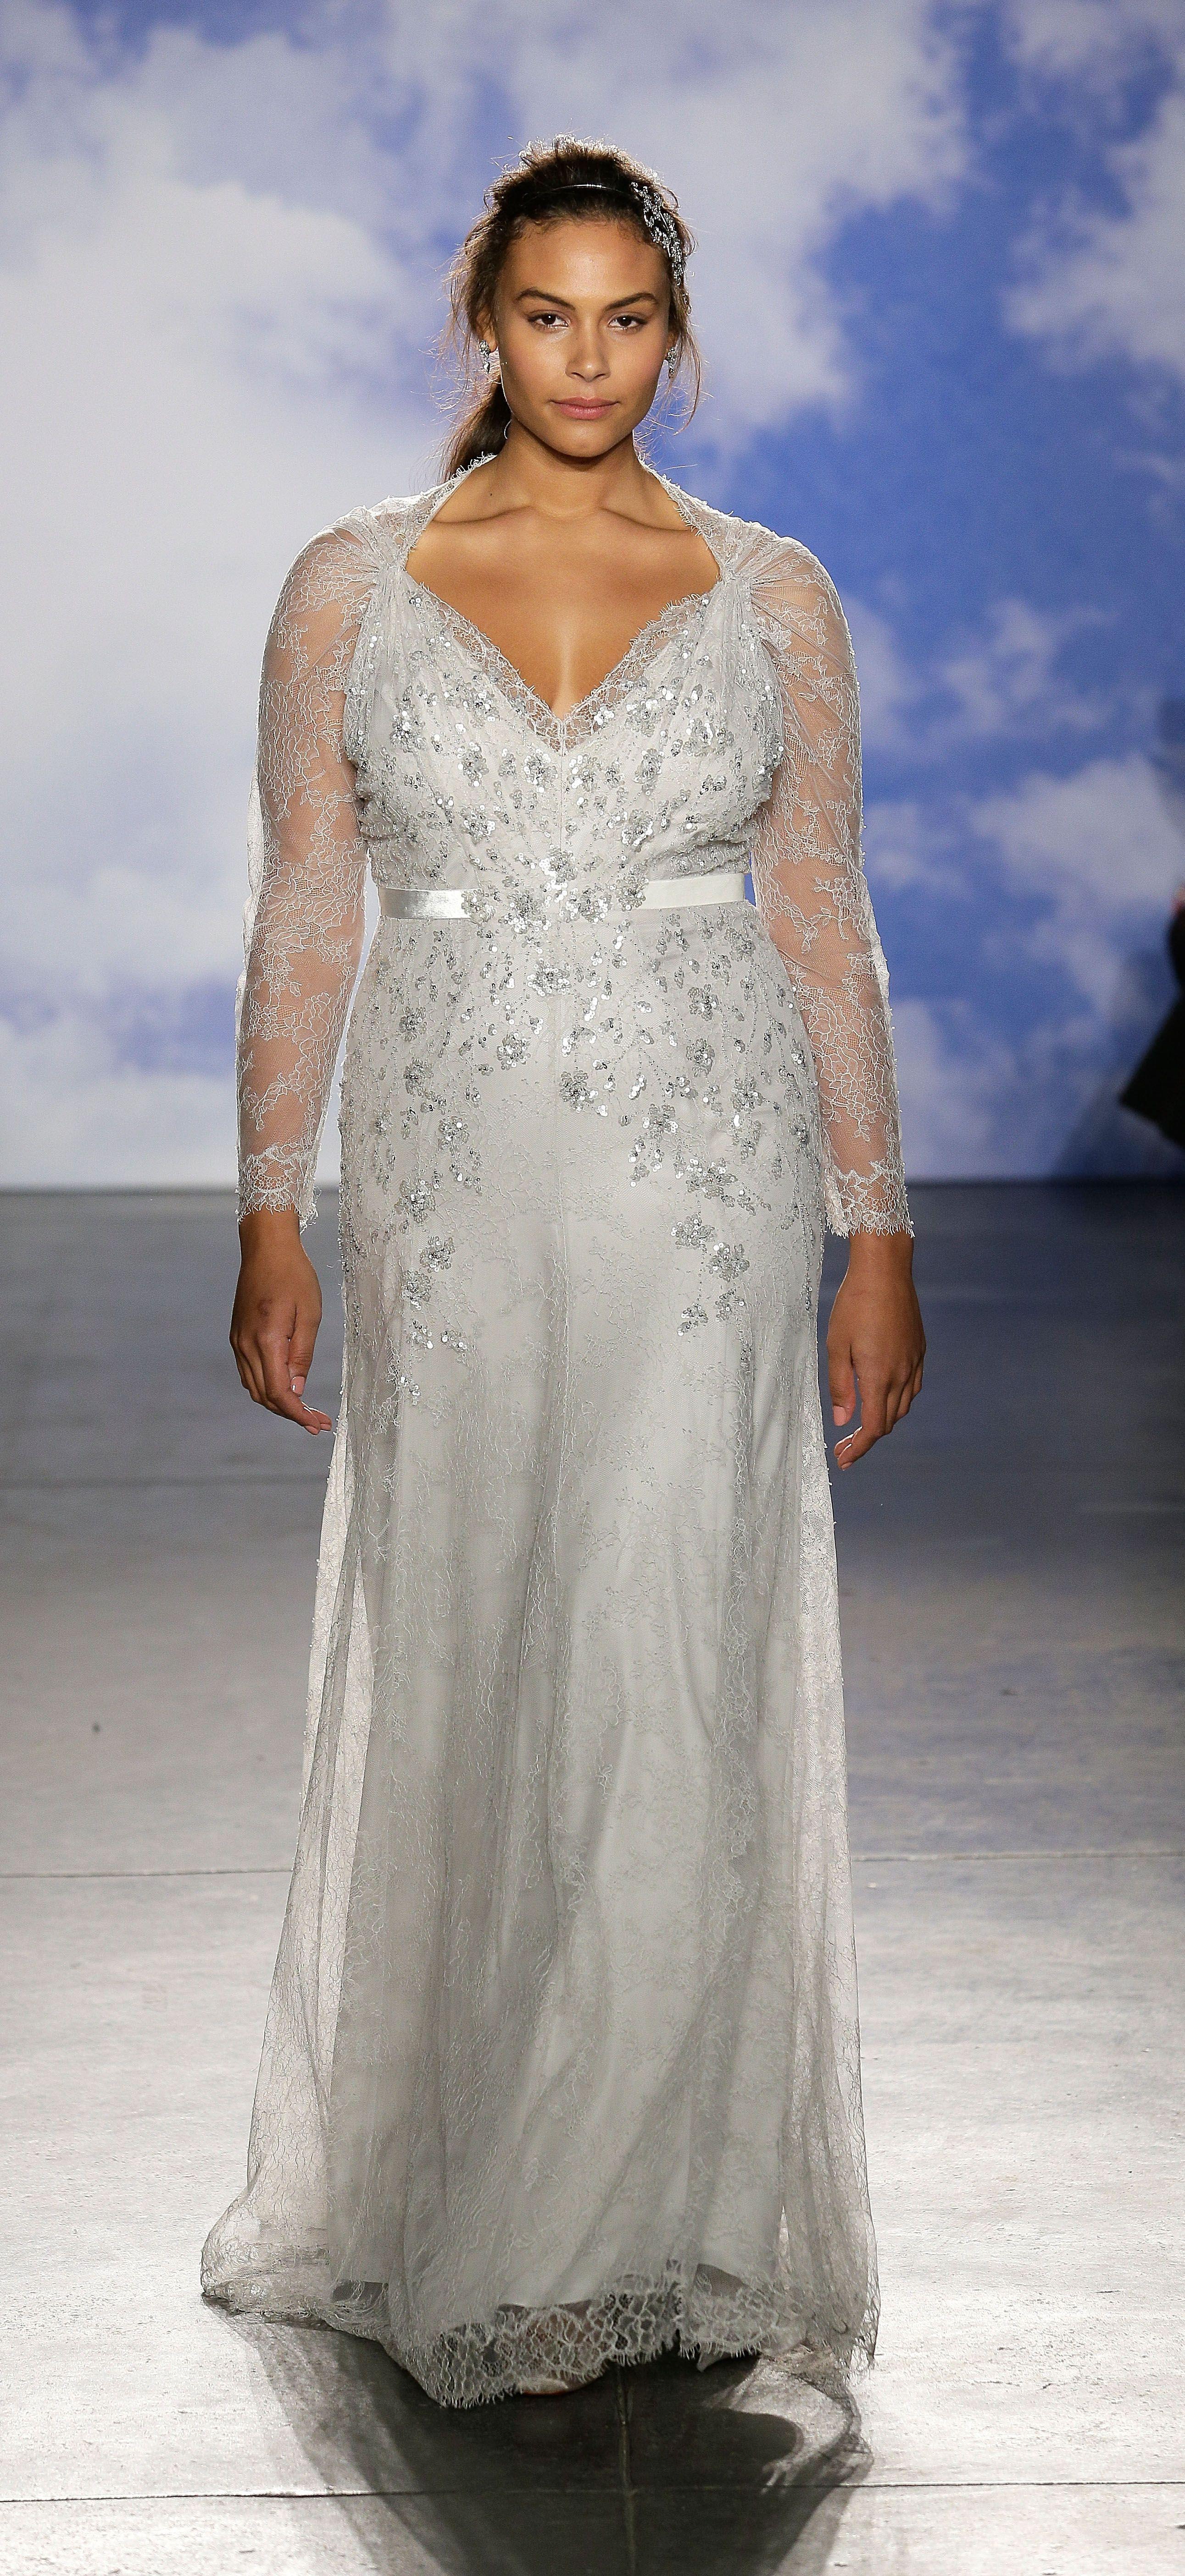 Silver wedding dresses plus size  Jenny Packham Gives PlusSize Brides Some Gorgeous Options  Jenny